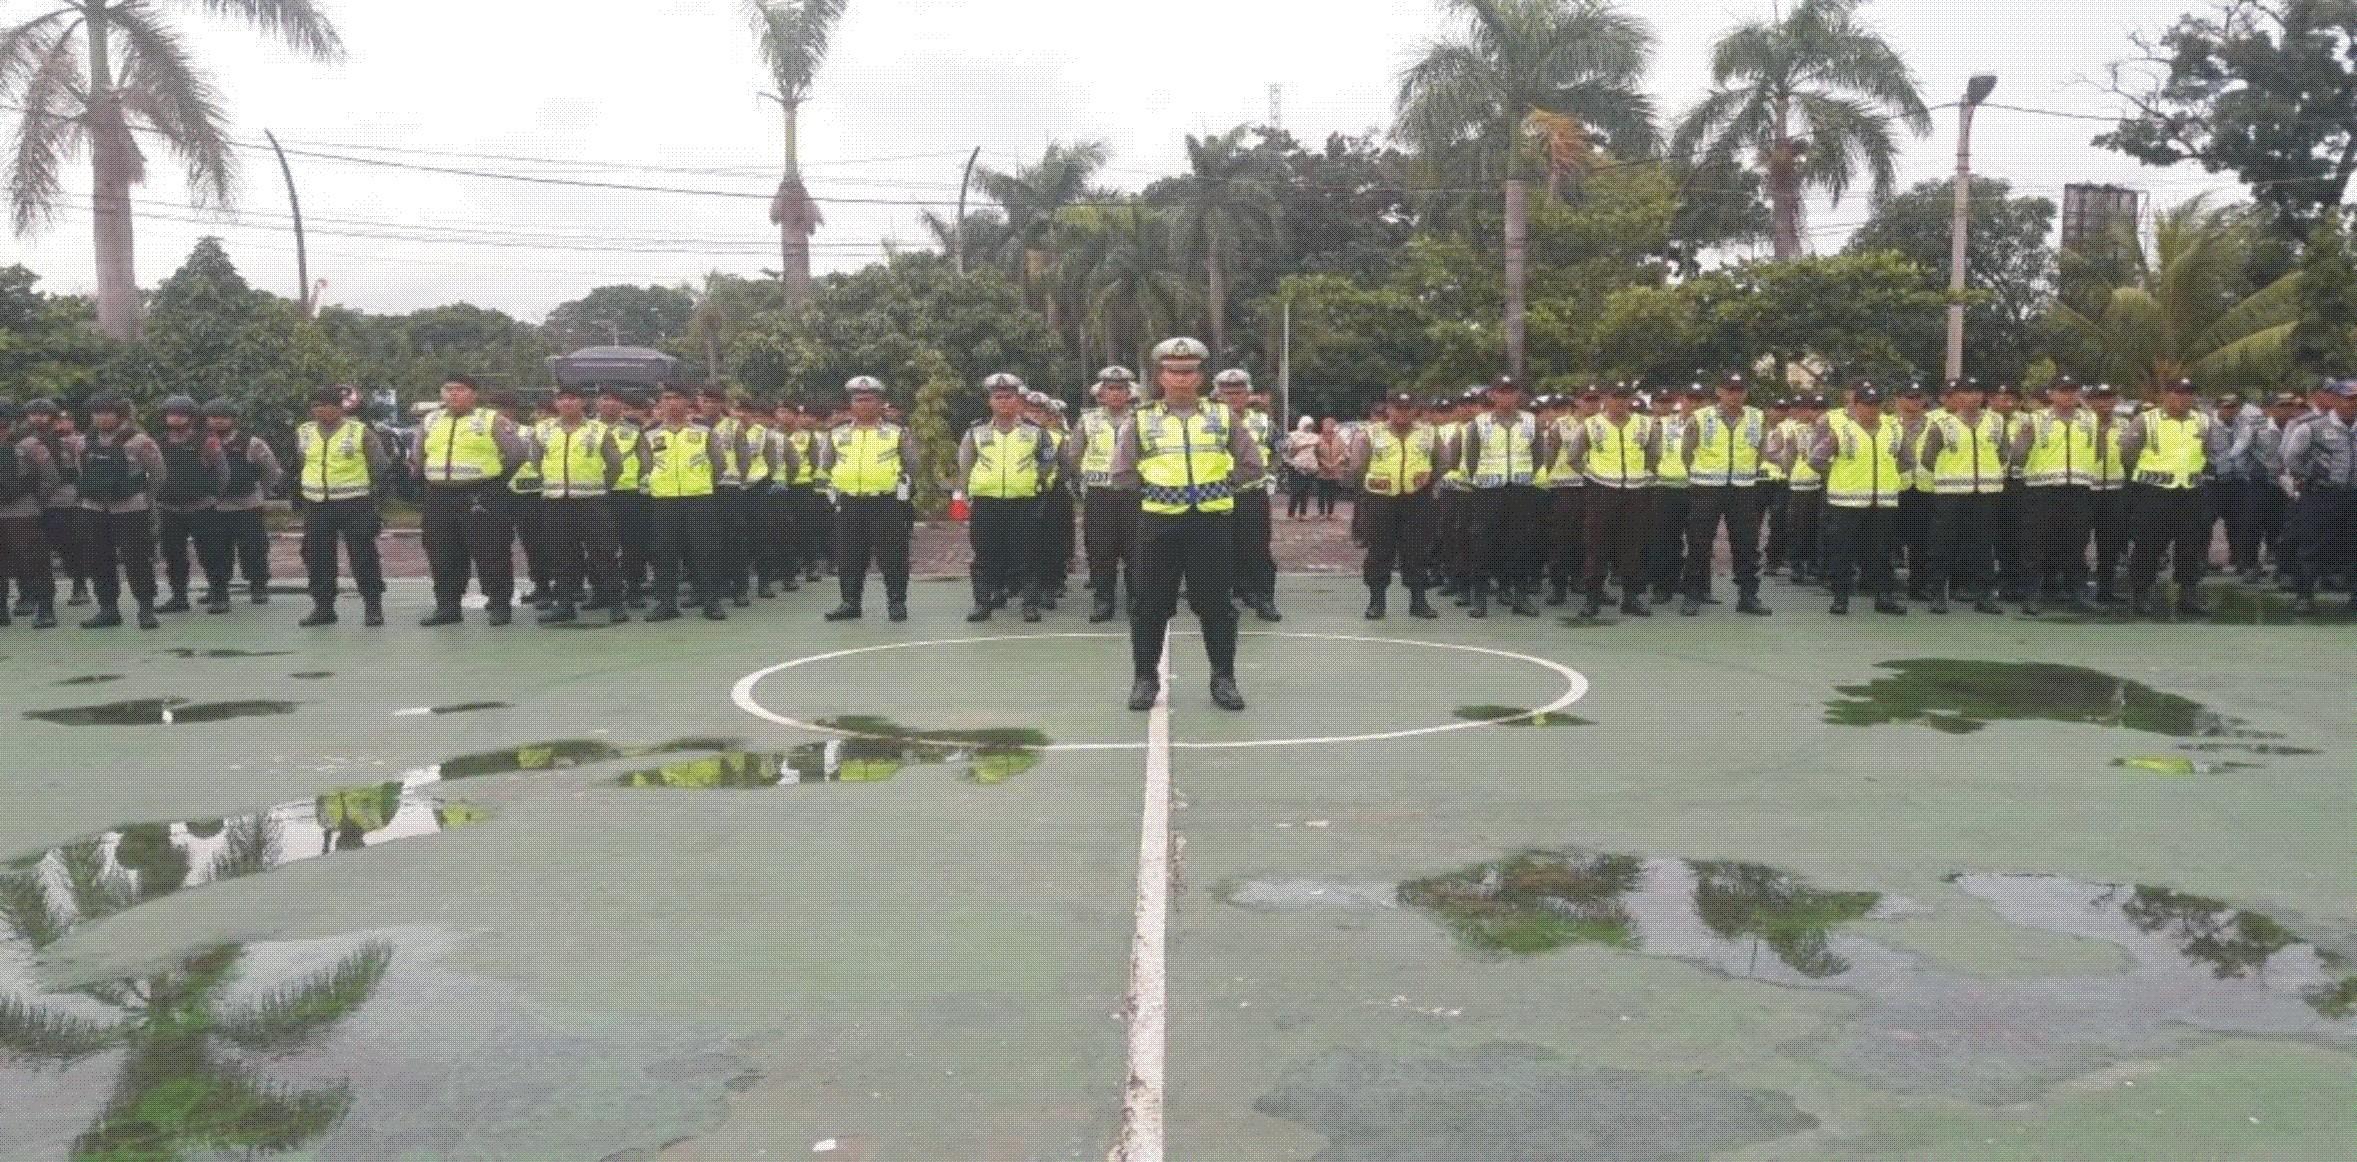 Liputan Banten Media Informasi Terkini Libur Imlek Februari 2018 Cilegon Selama Hari Raya Polres Akan Memfokuskan Pengamanan Di Pelabuhan Merak Dan Jalur Pariwisata Sekitar